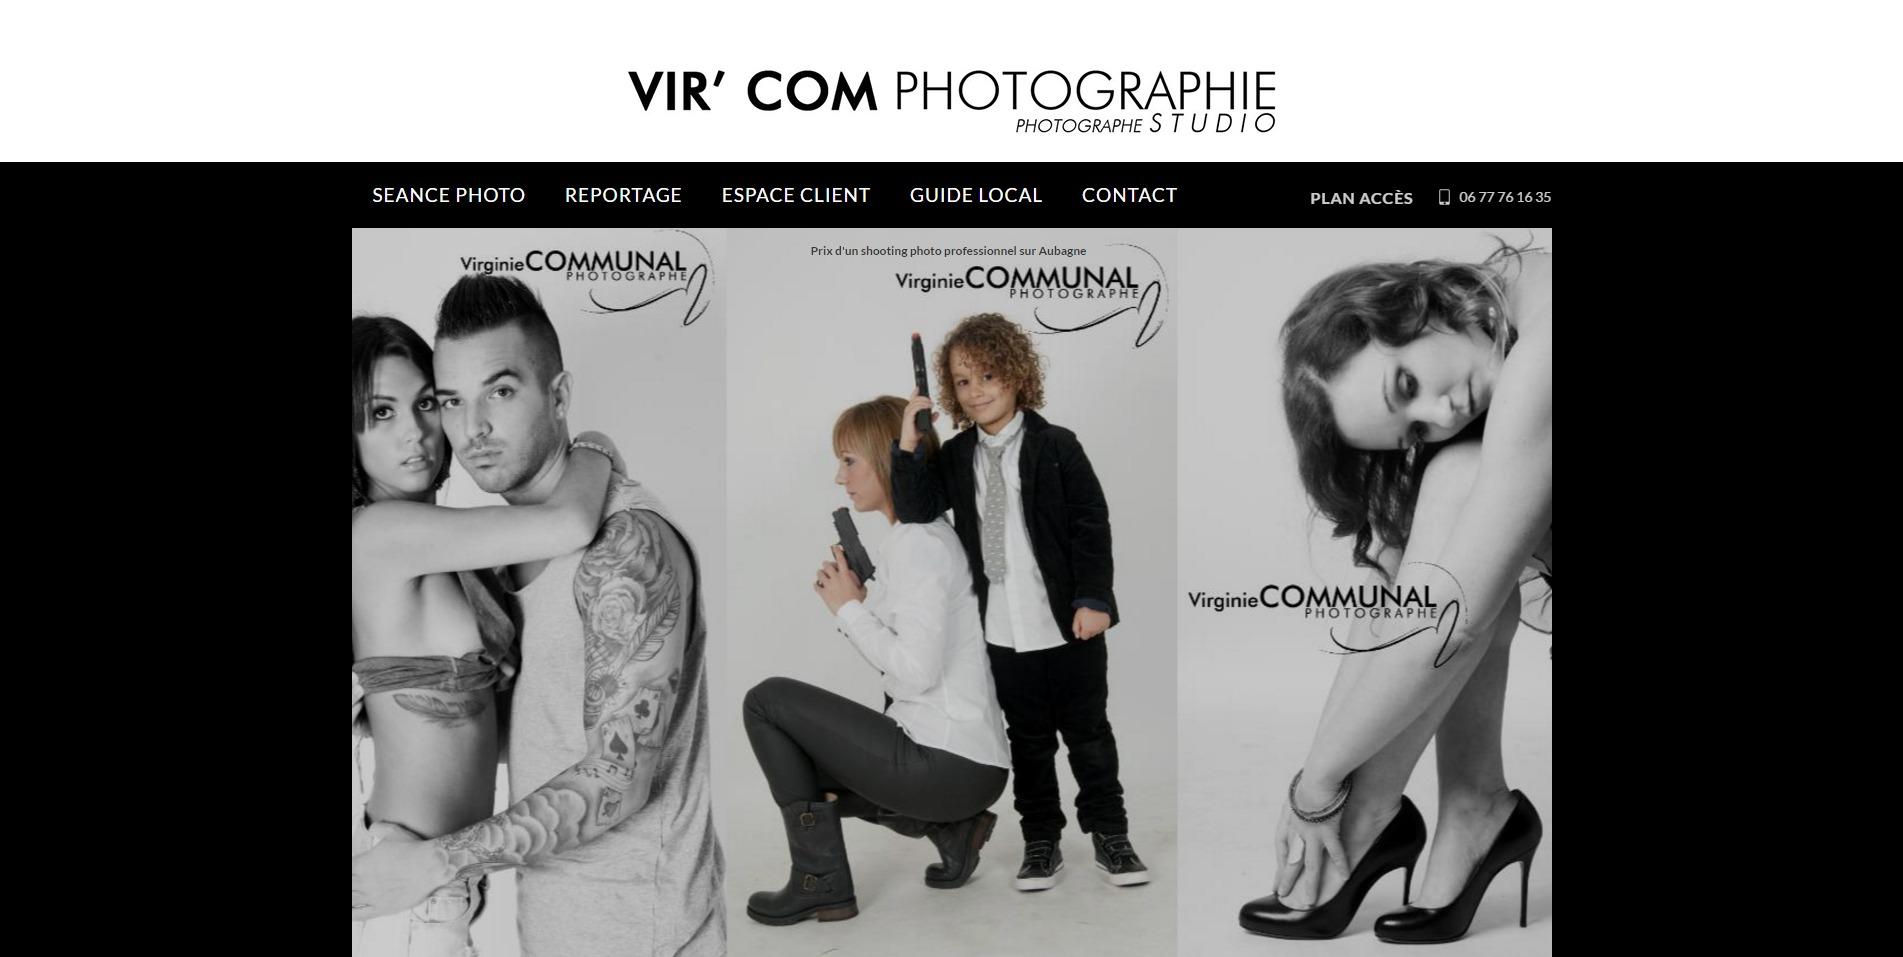 vircomphotographie